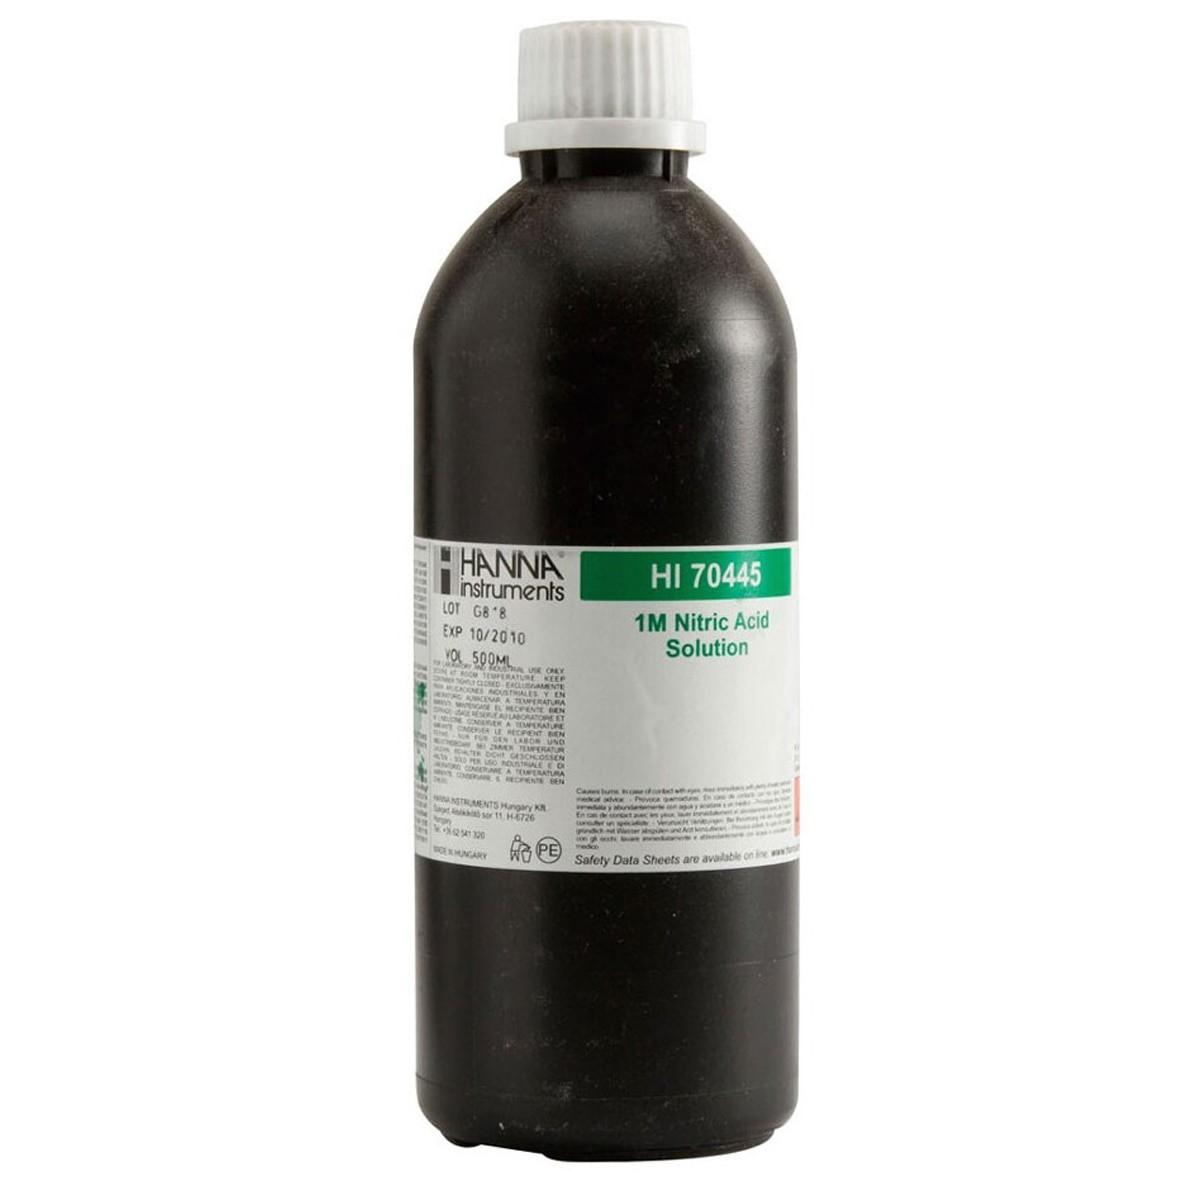 Nitric Acid Solution 1M, 500 mL - HI70445